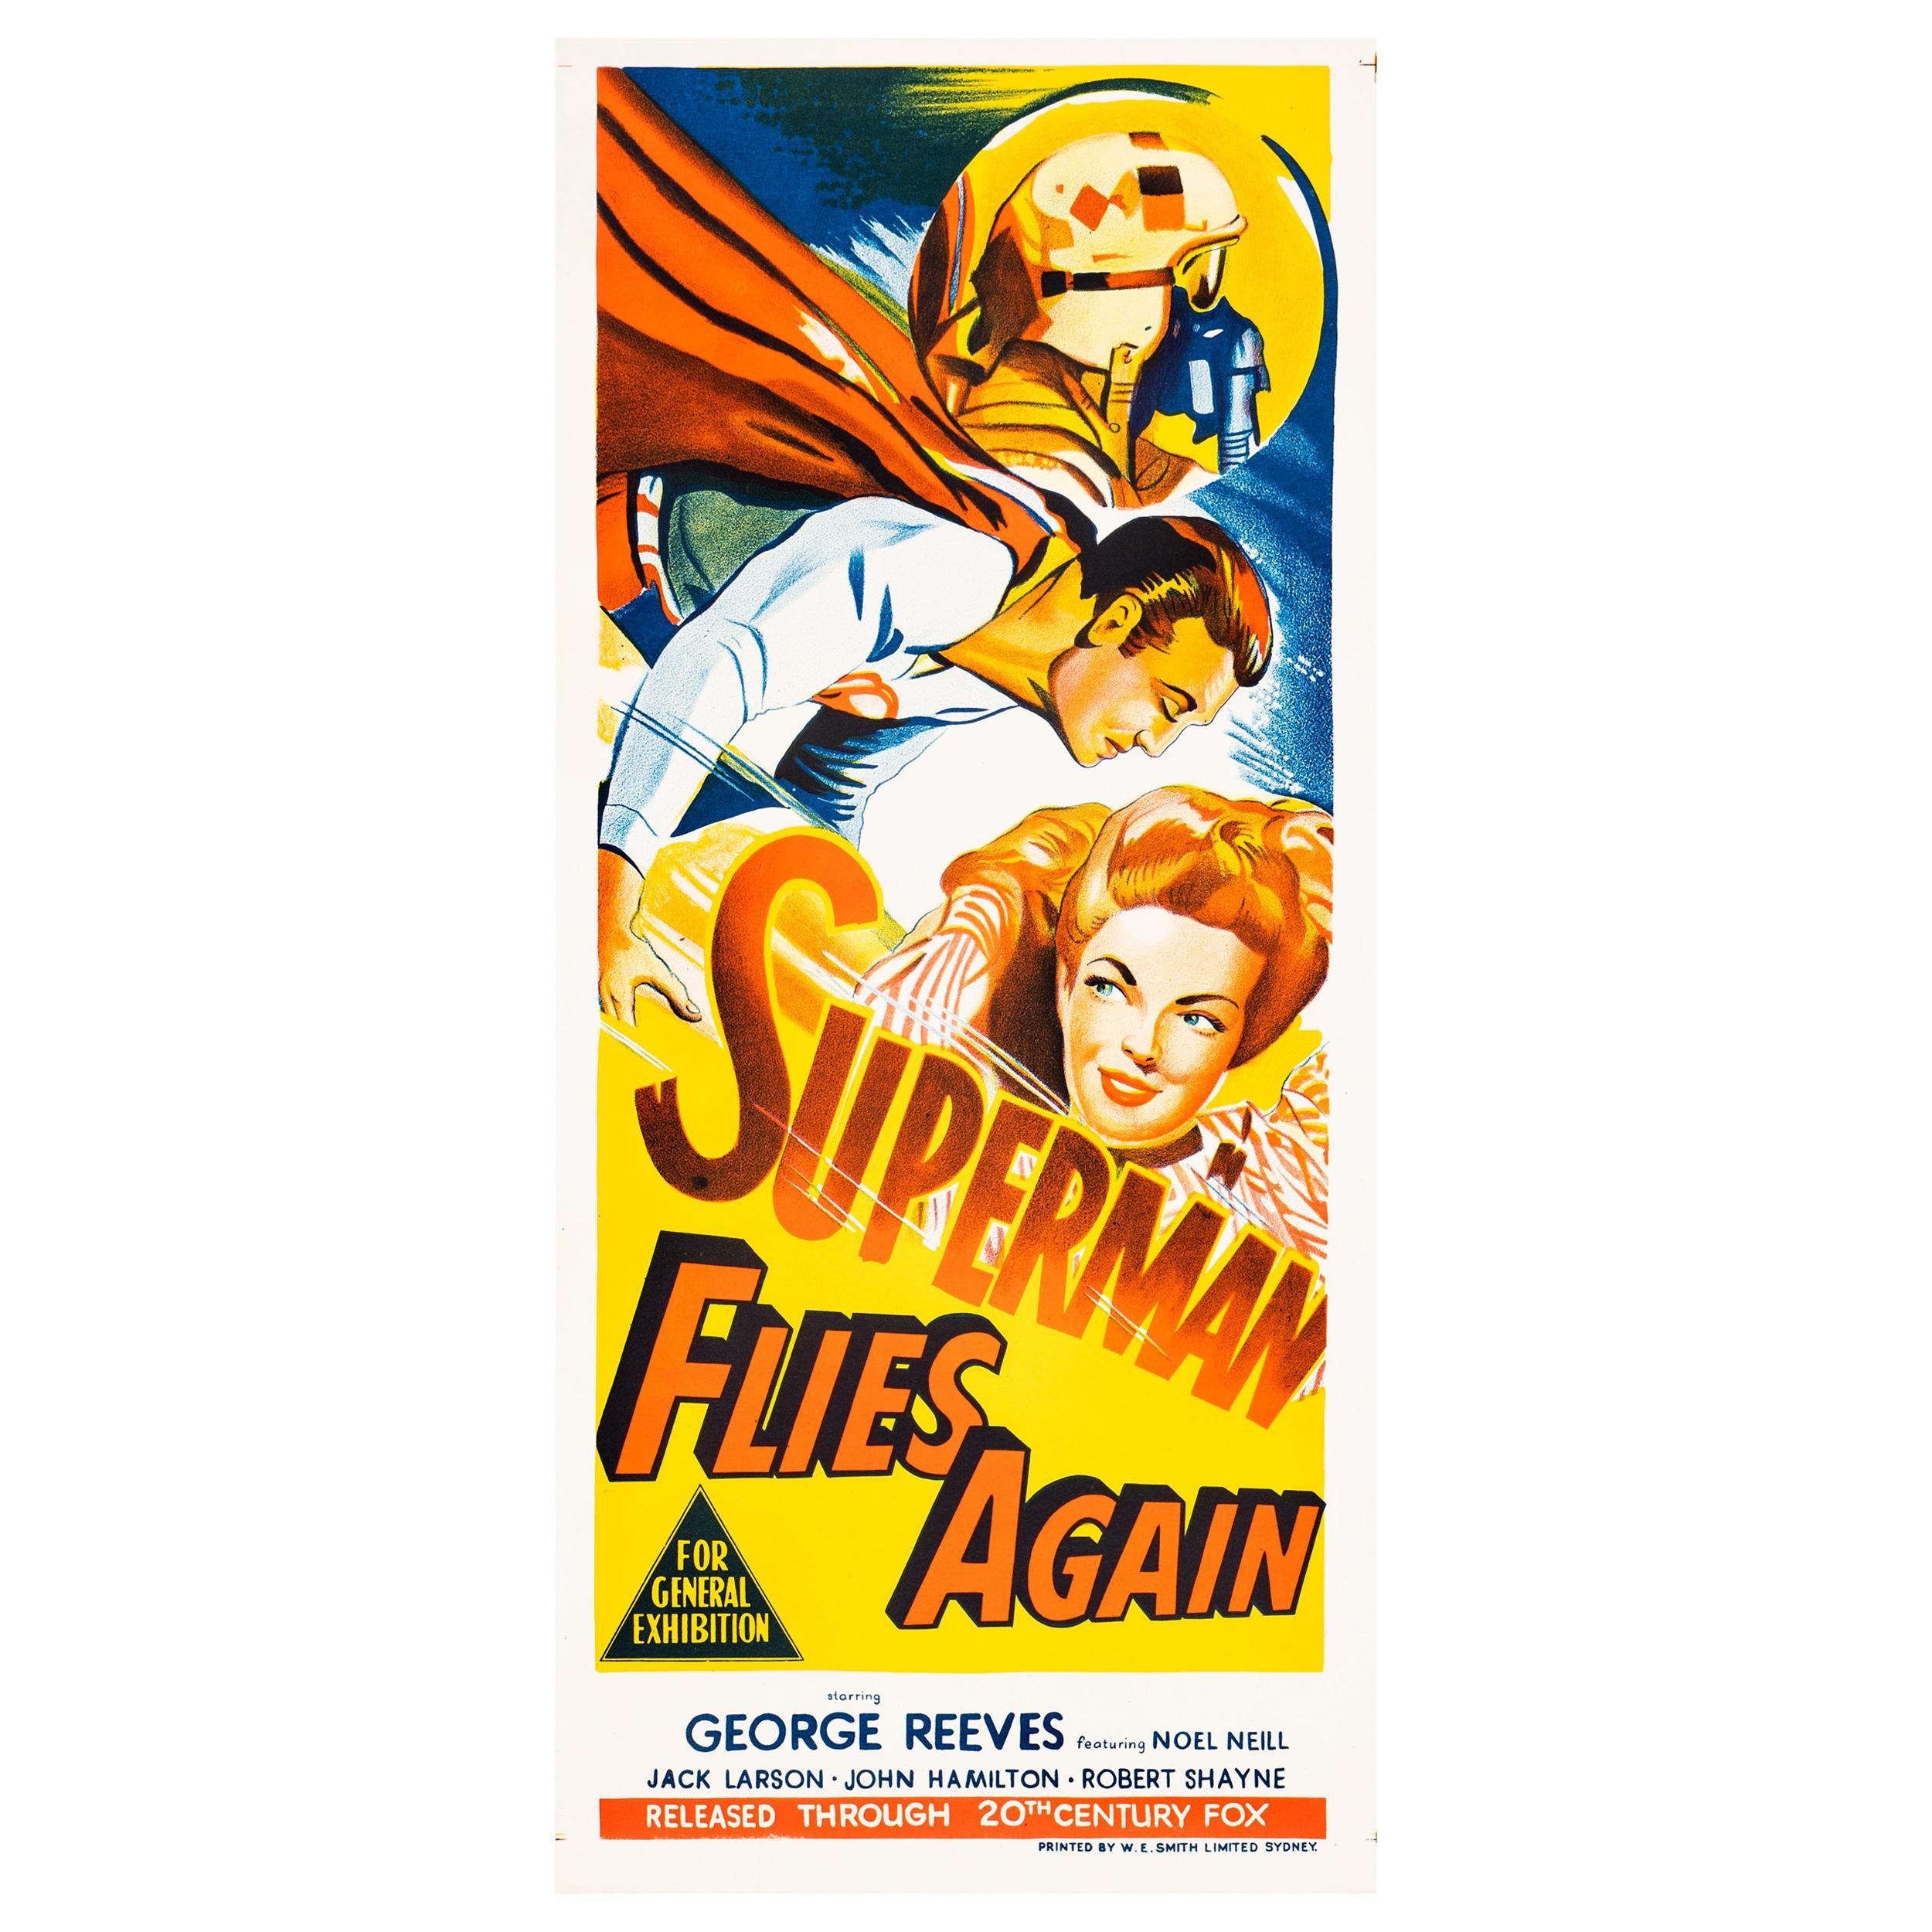 'Superman Flies Again' Original Vintage Australian Daybill Movie Poster, 1954